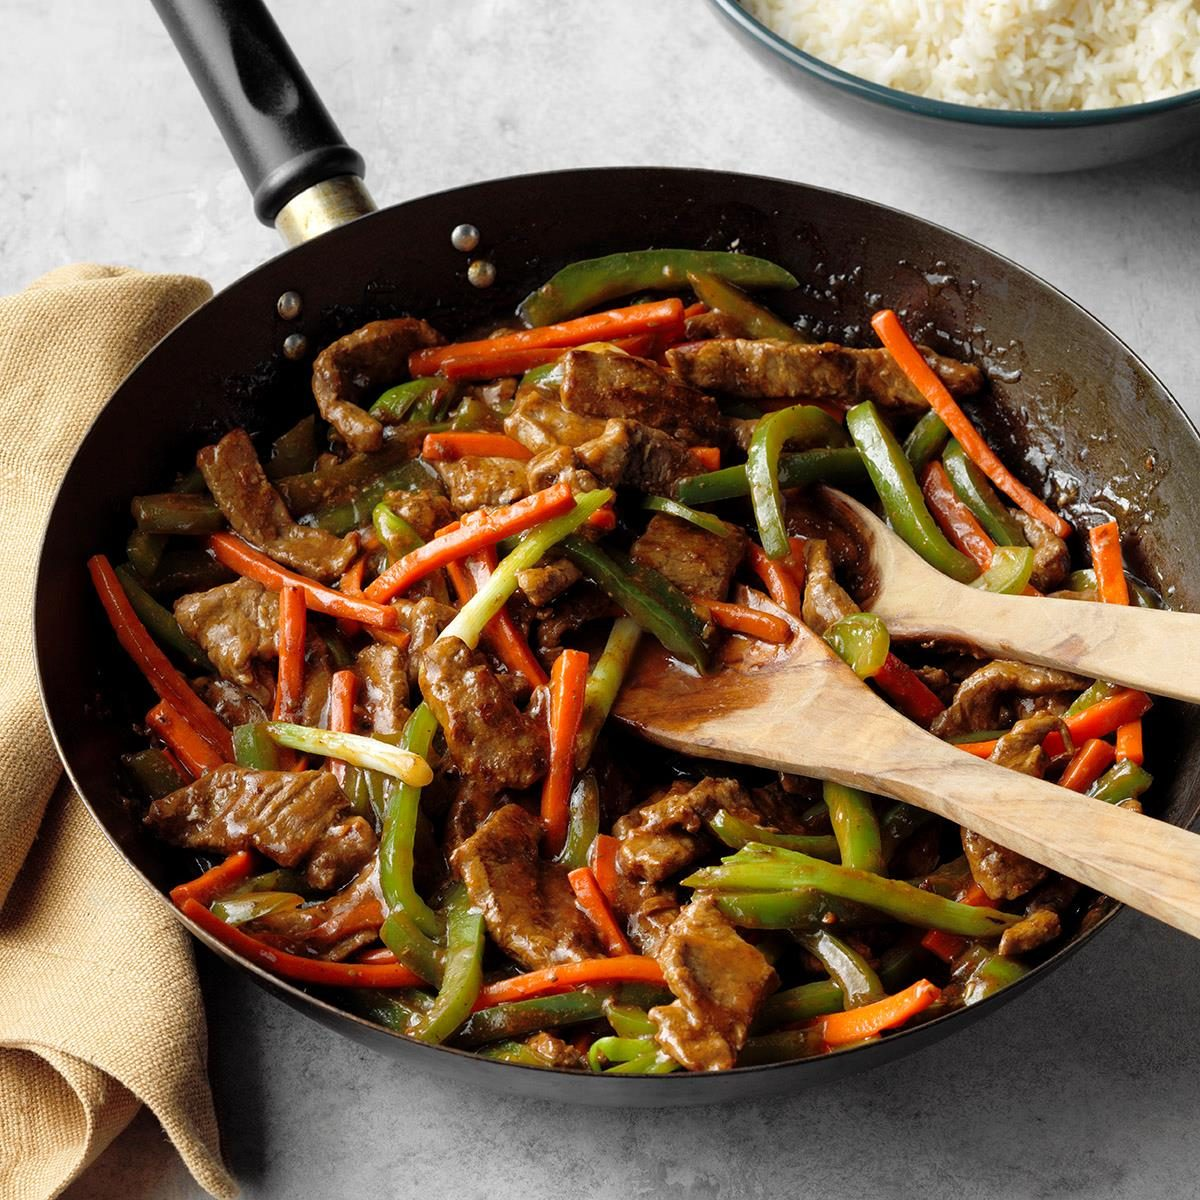 Friday: Steak Stir-Fry